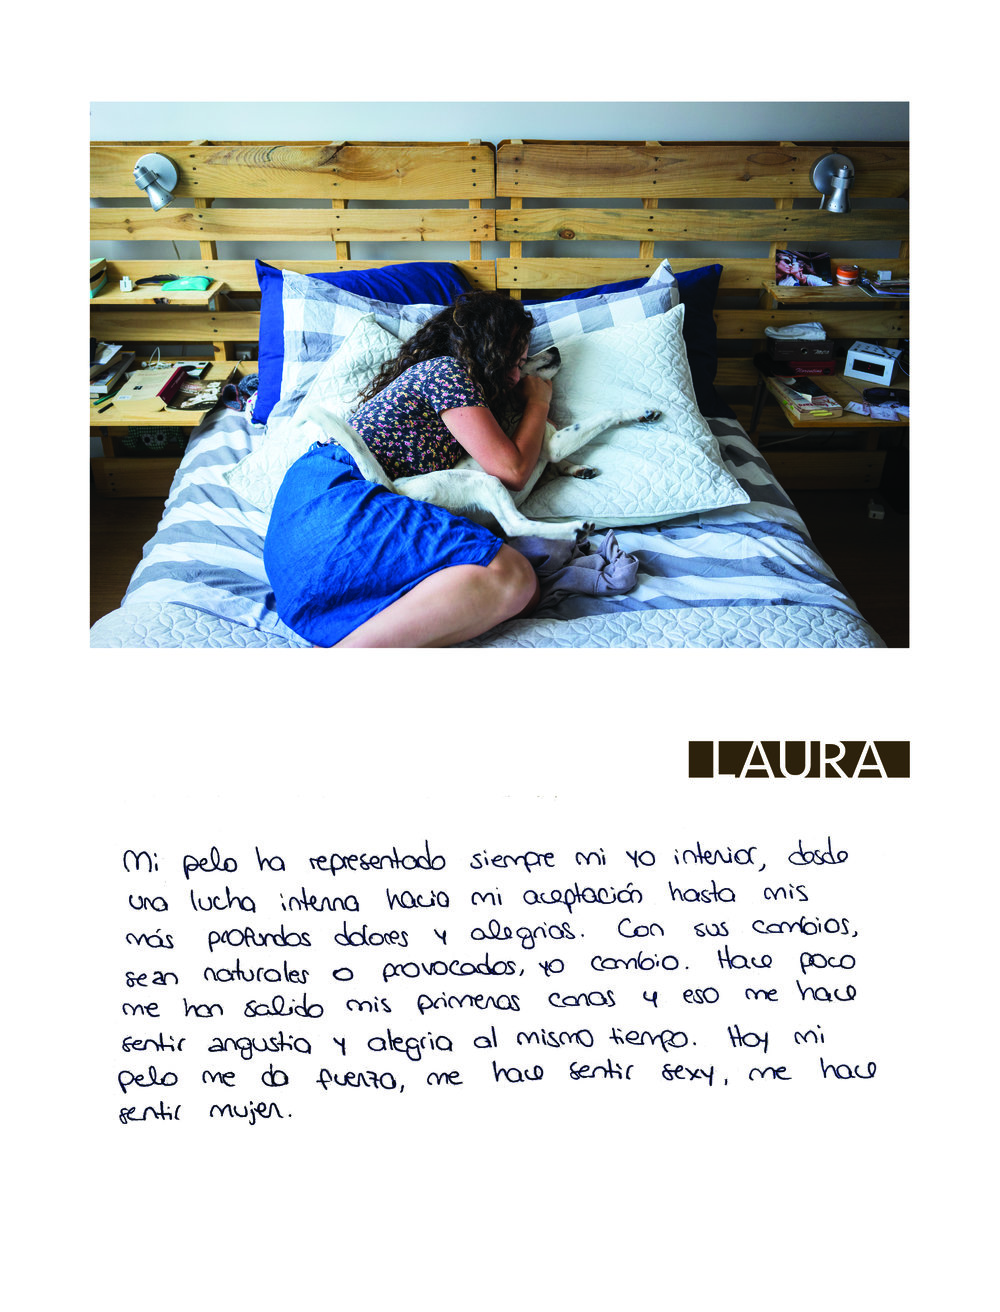 6.Laura.jpg